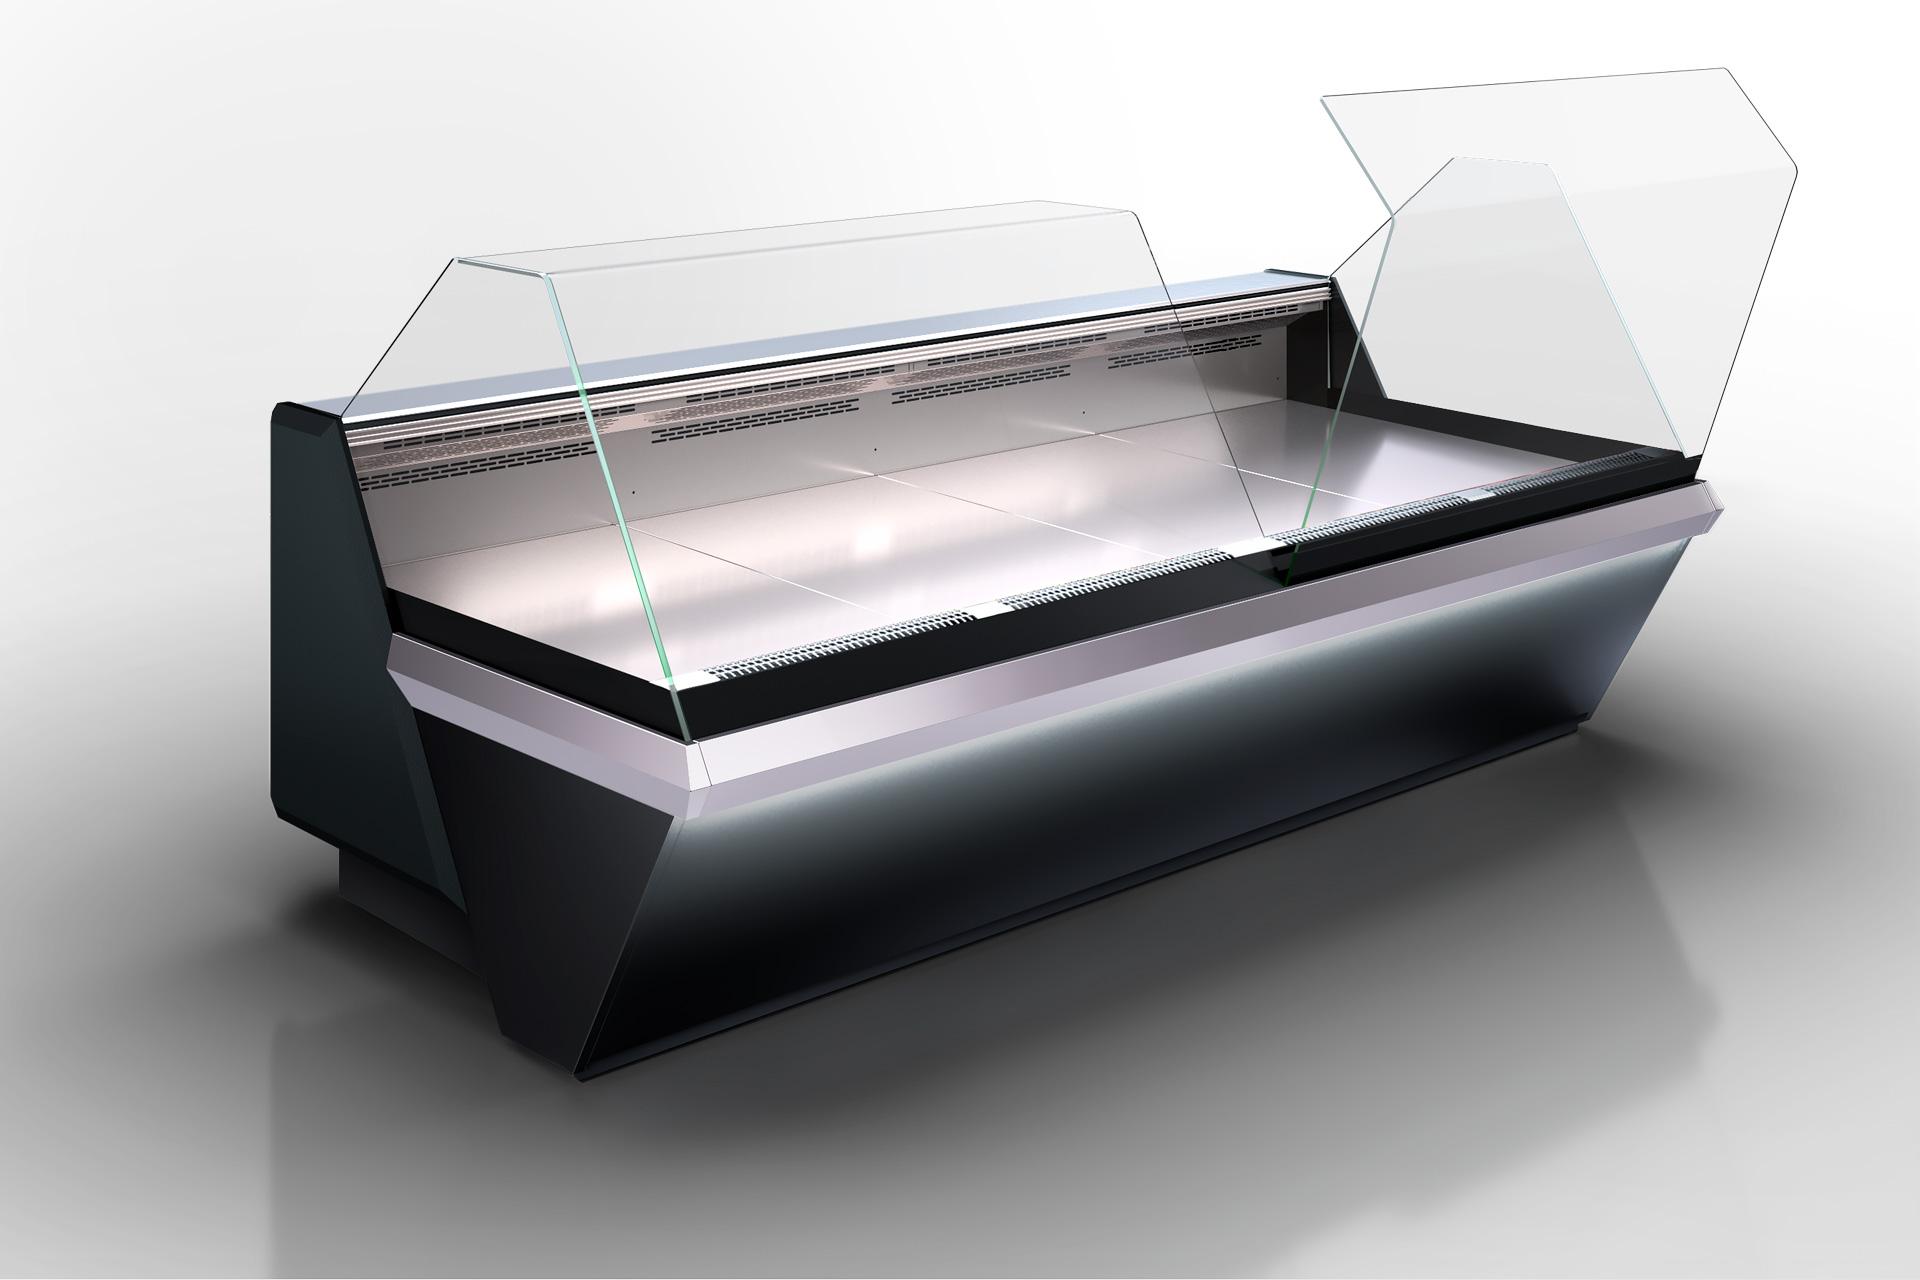 Холодильная витрина Missouri enigma MK 120 deli OS 120-DBM